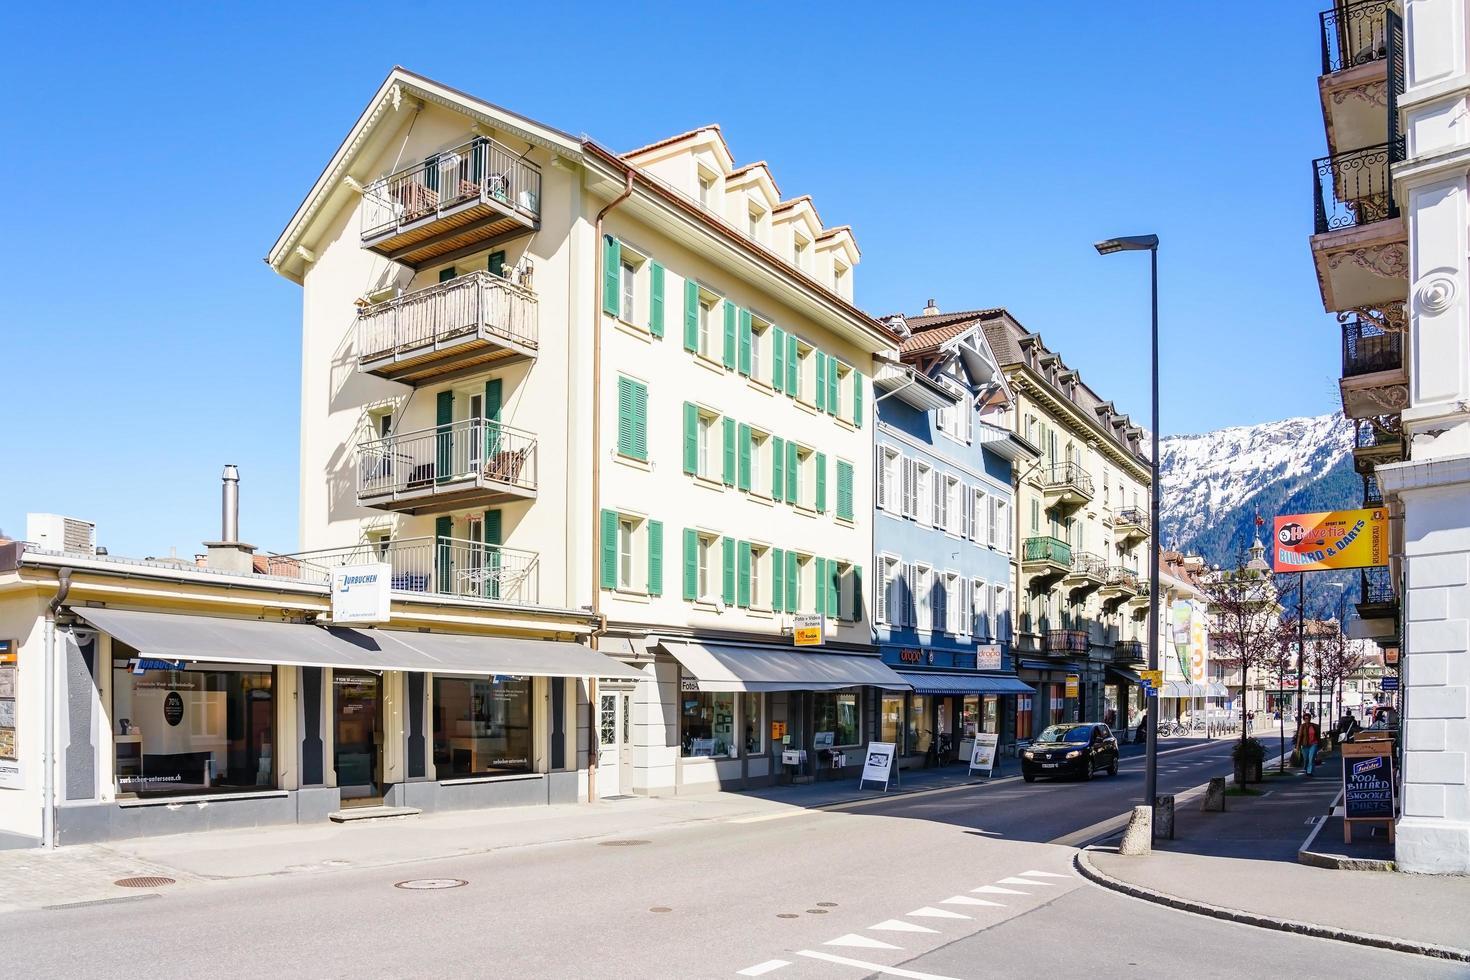 Vieille ville d'Interlaken, Suisse, 2018 photo